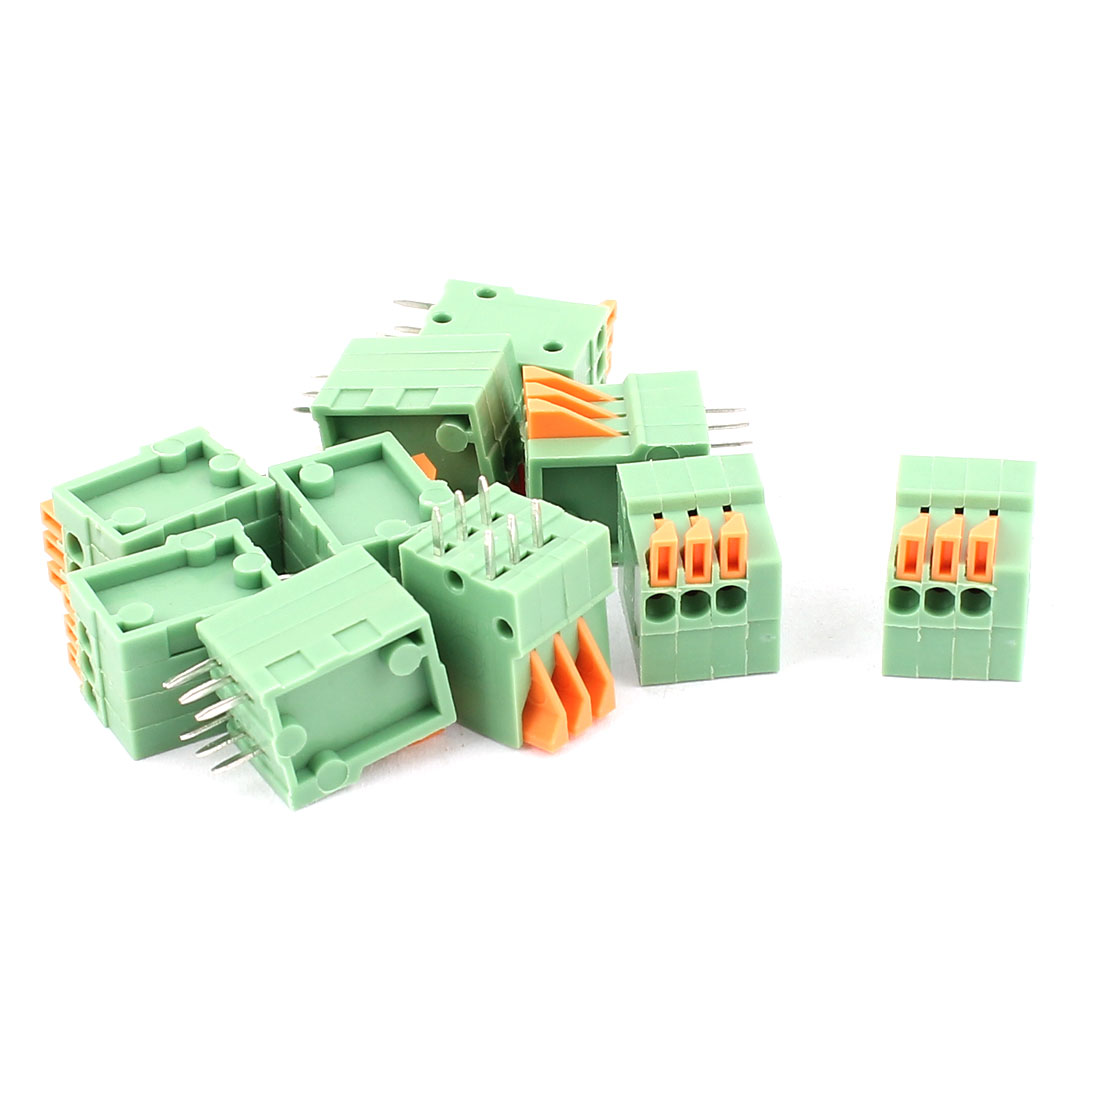 10 Pcs 2.54mm Pitch 2x3 Terminals PCB Spring Type Plug-in Terminal Blocks